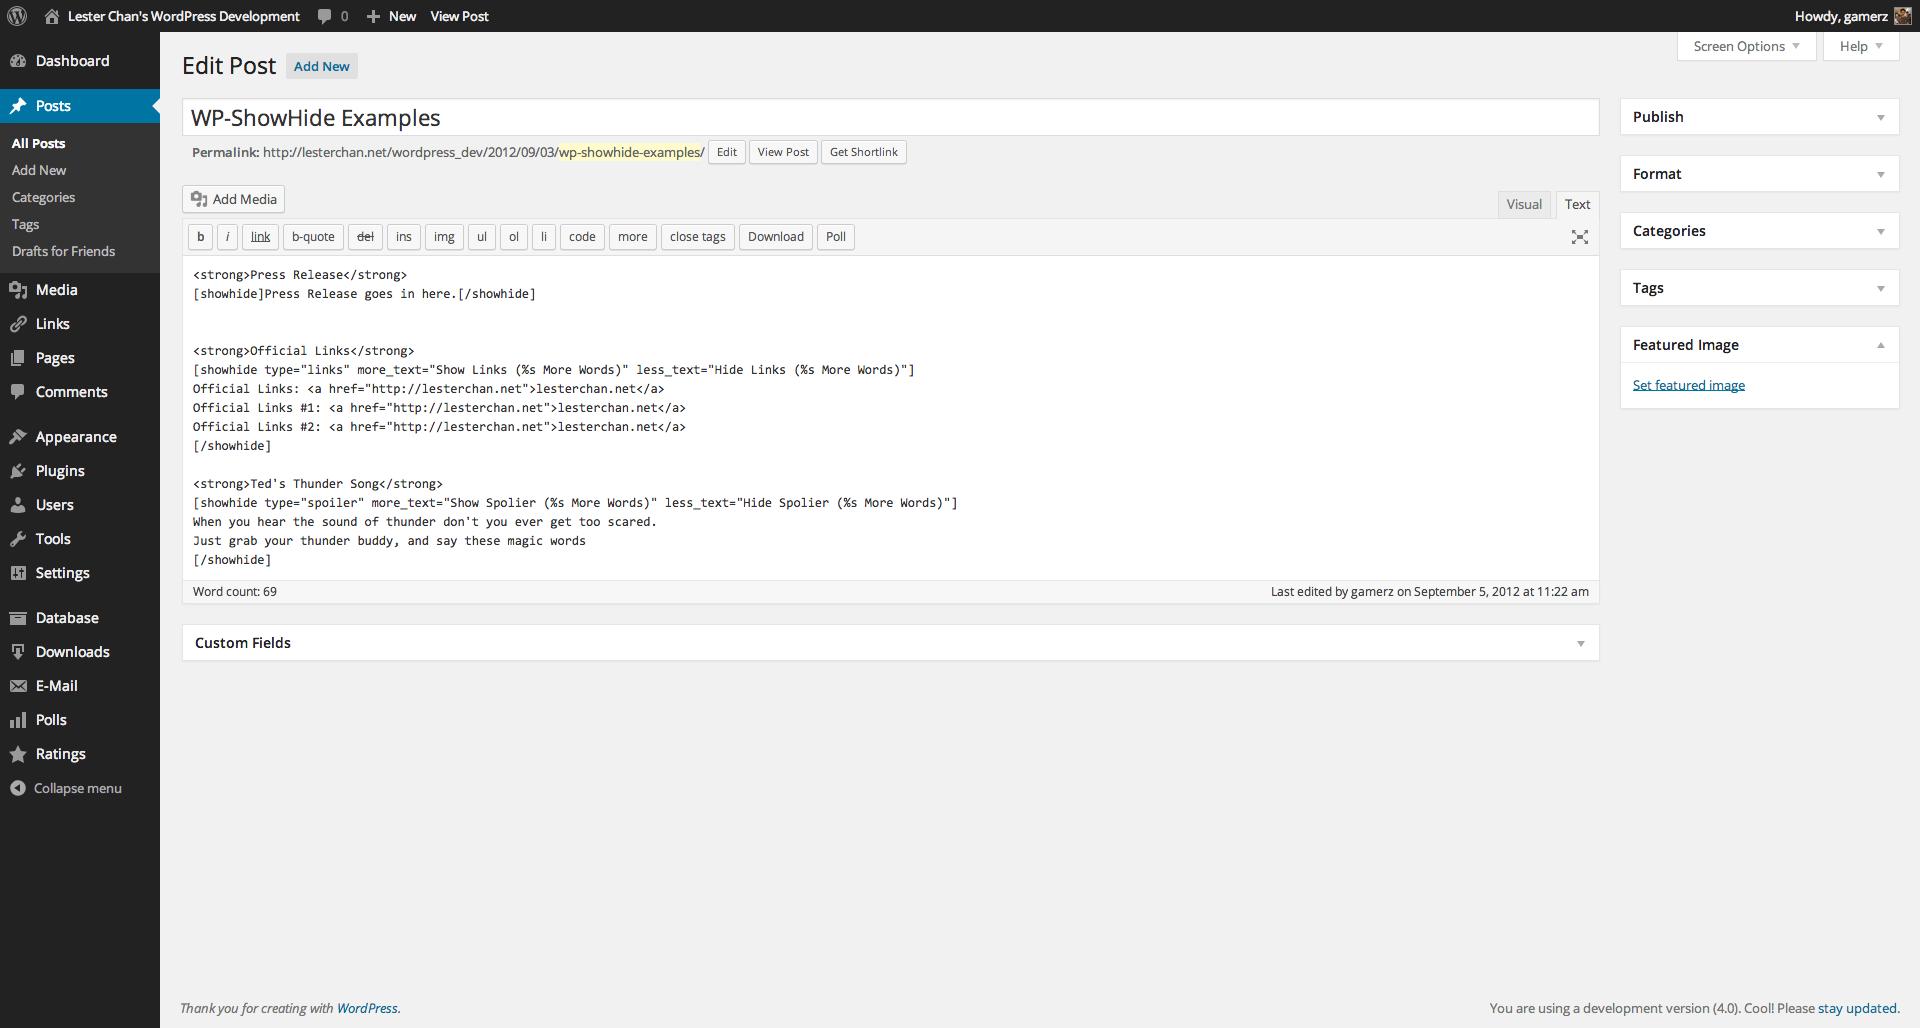 WP-ShowHide's Screenshot: Editor - Short Code